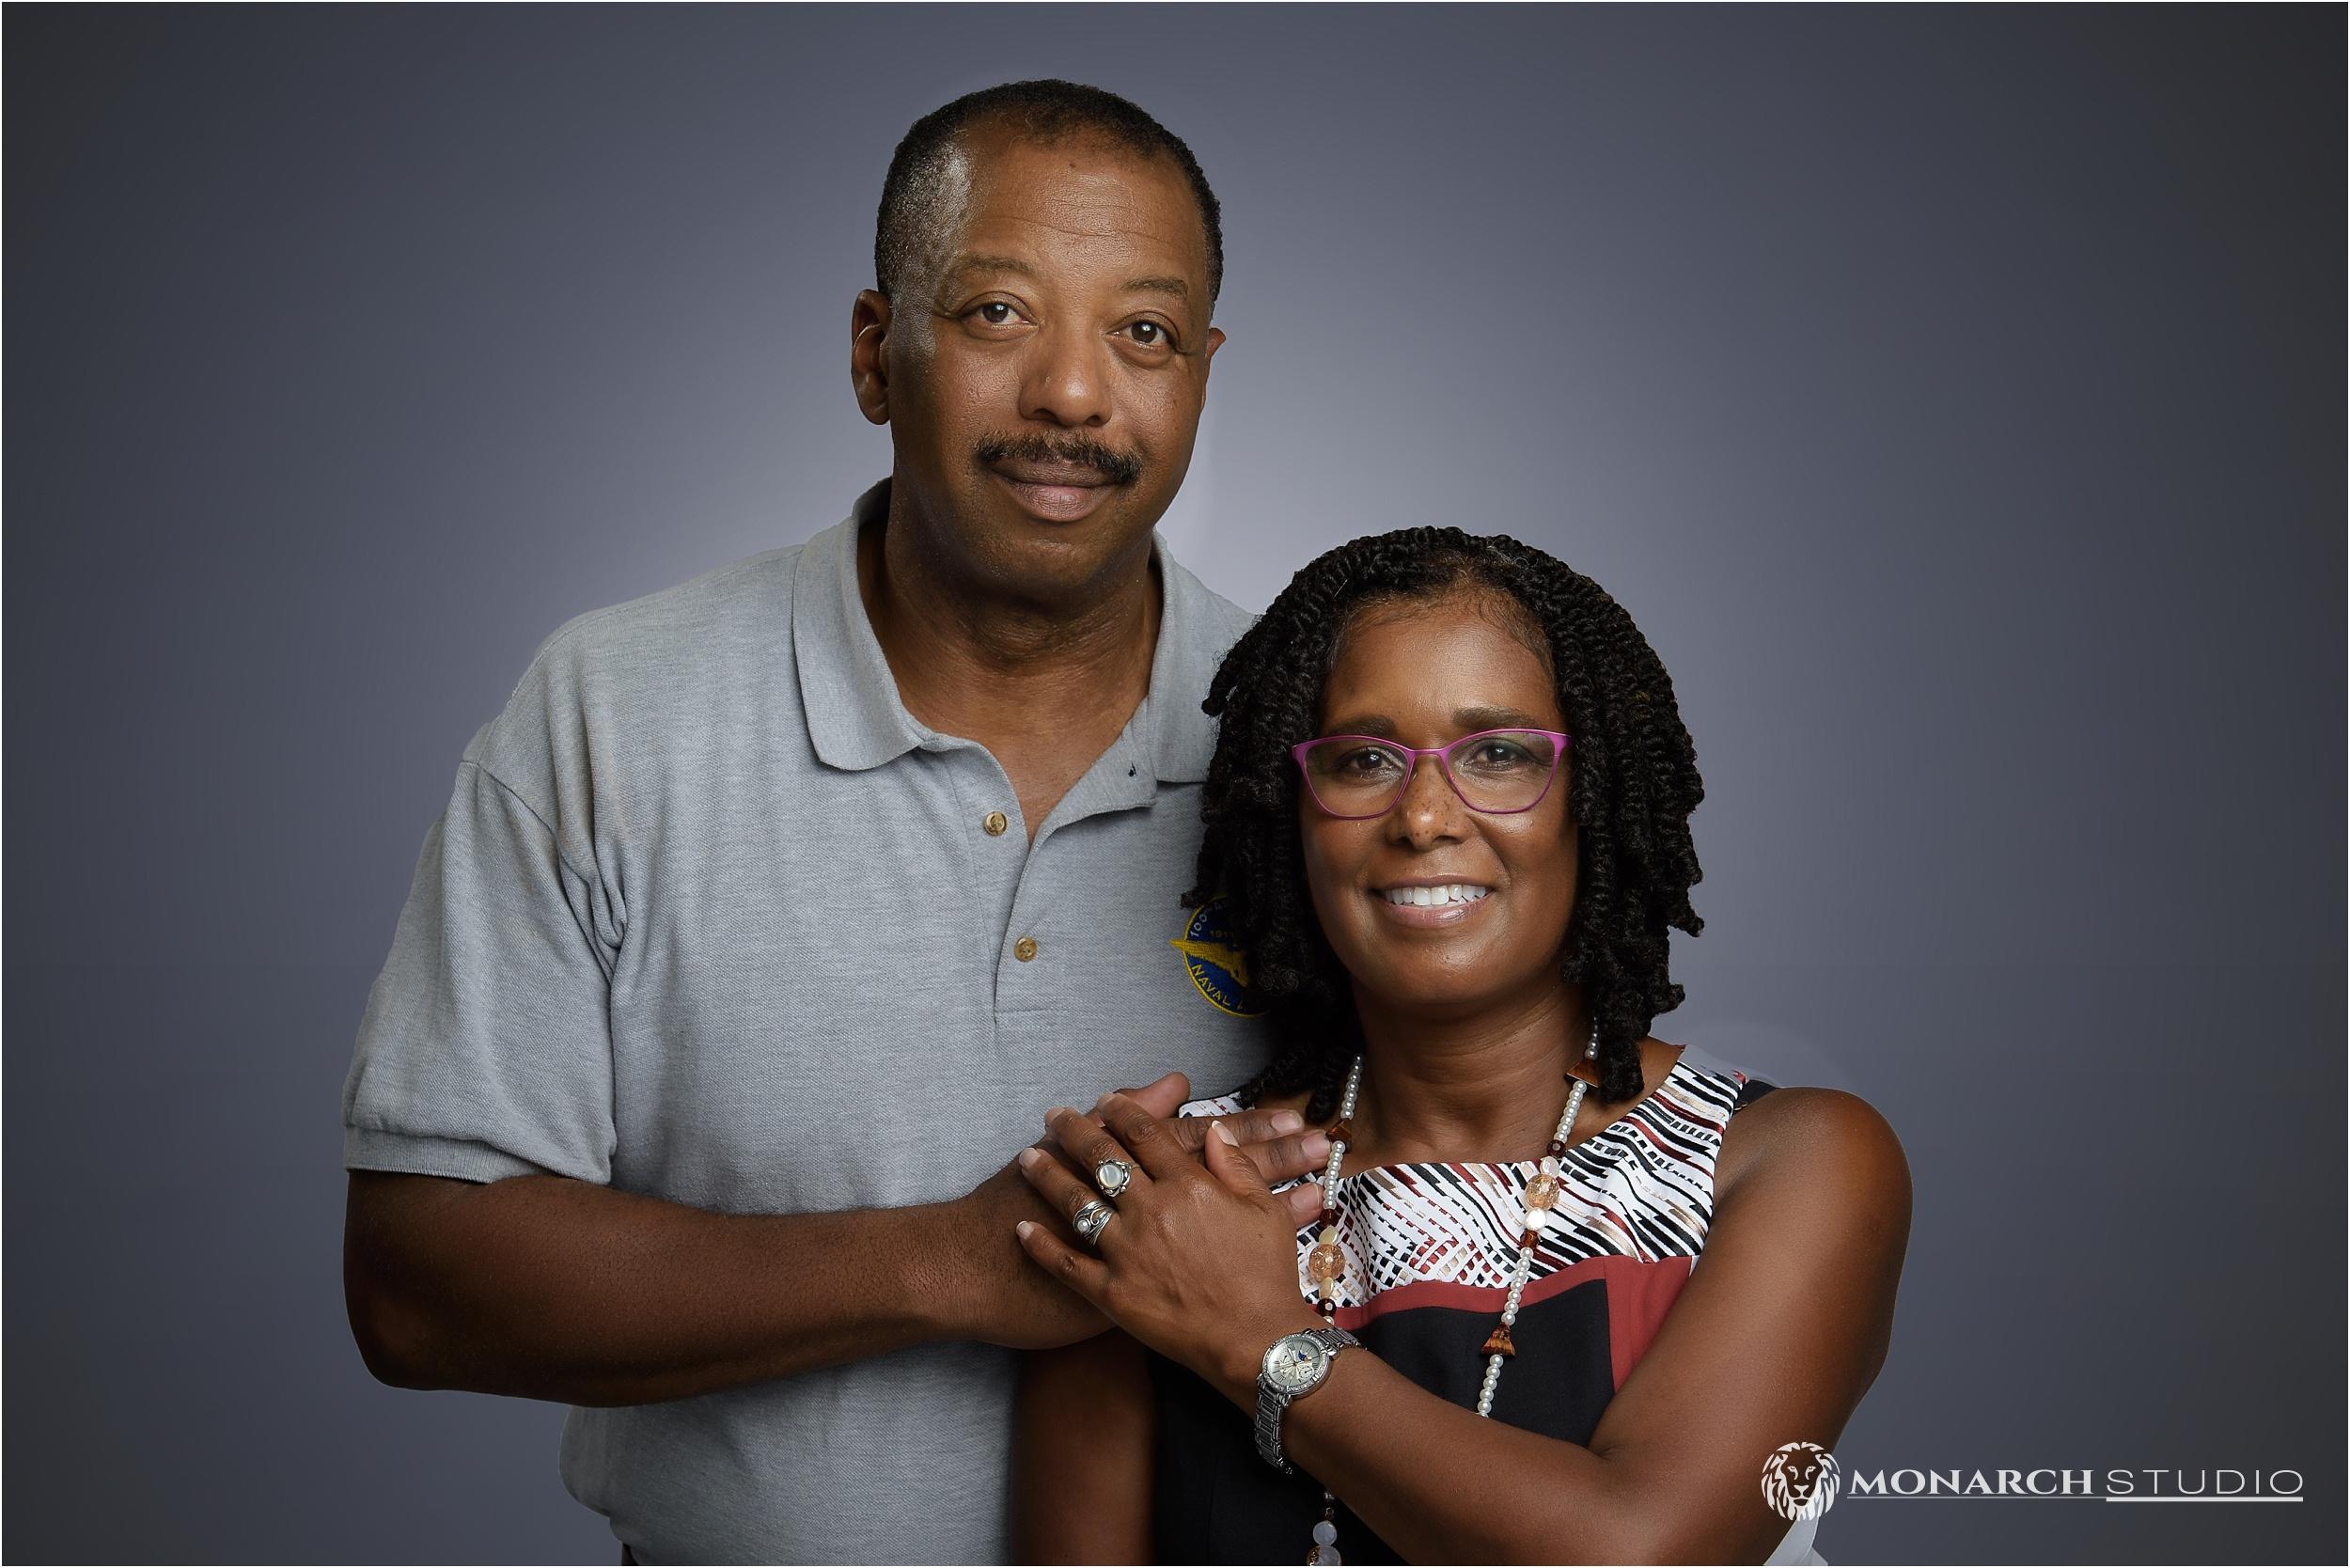 st-augustine-photographer-family-reunion-portrait-016.jpg